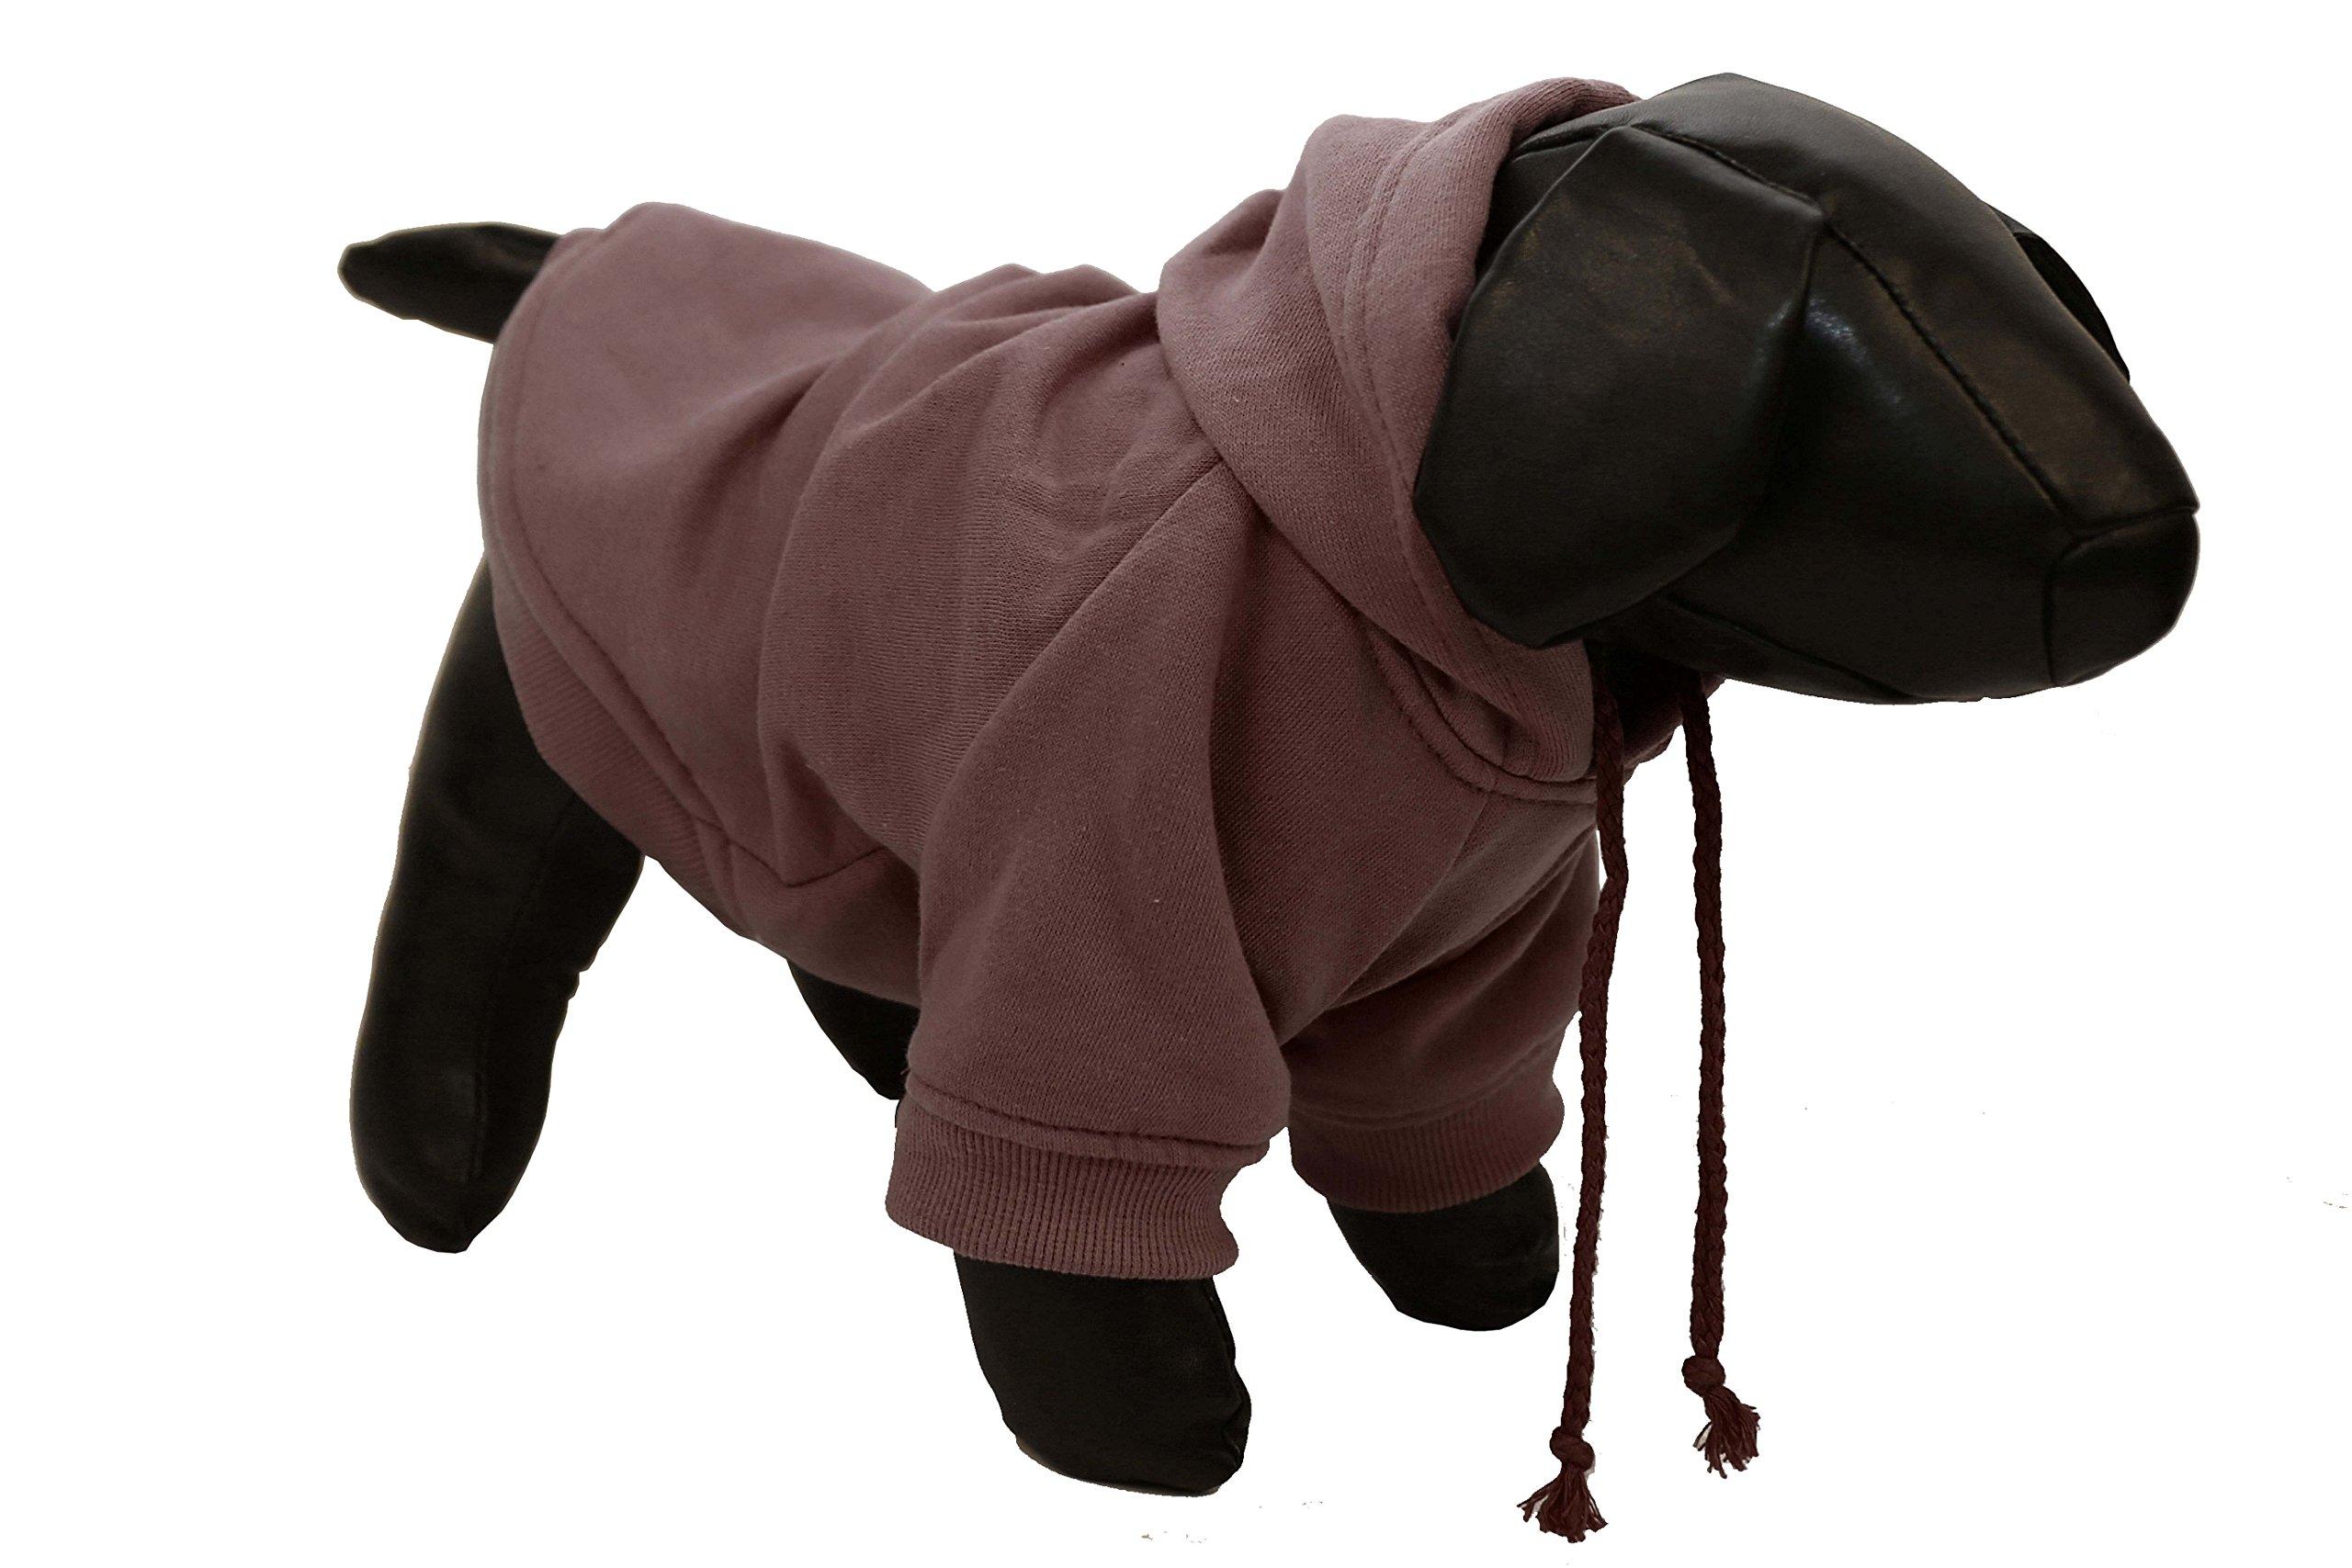 Pet Life American Classic' Designer Fashion Plush Cotton Pet Dog Hooded Sweater Hoodie, Medium, Brown